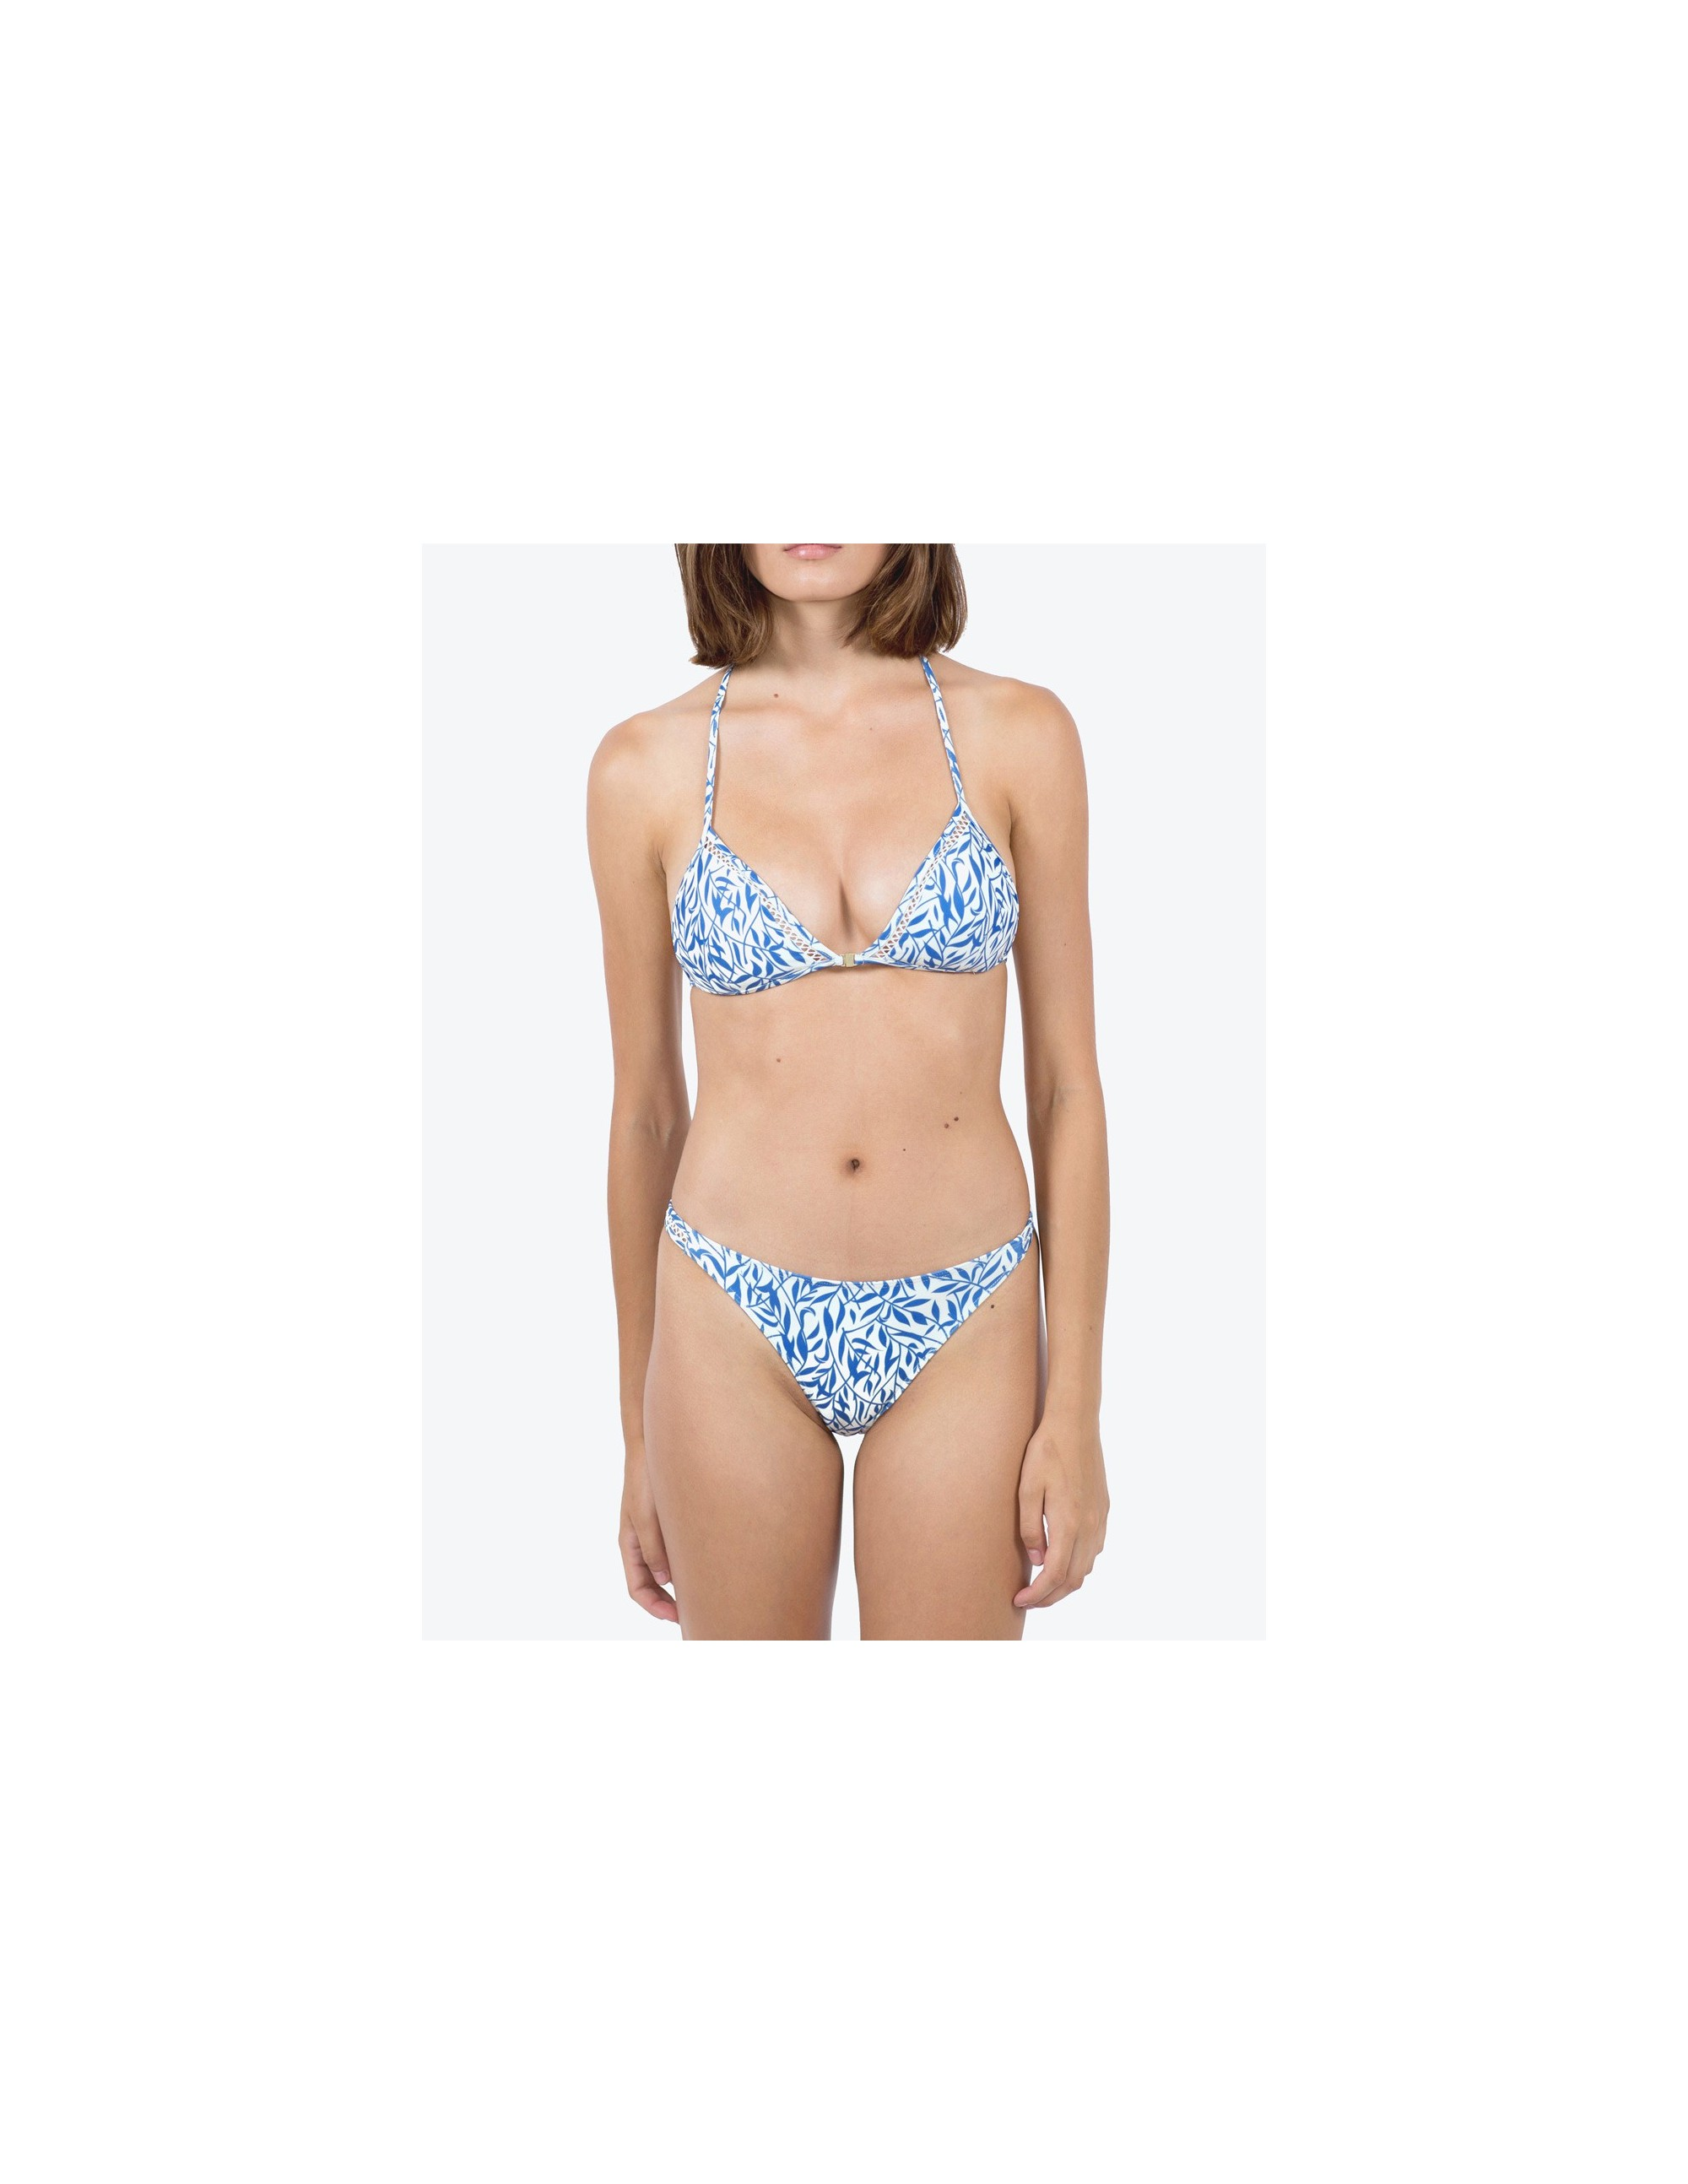 ANAMUR bikini bottom - FLORAL BLUE